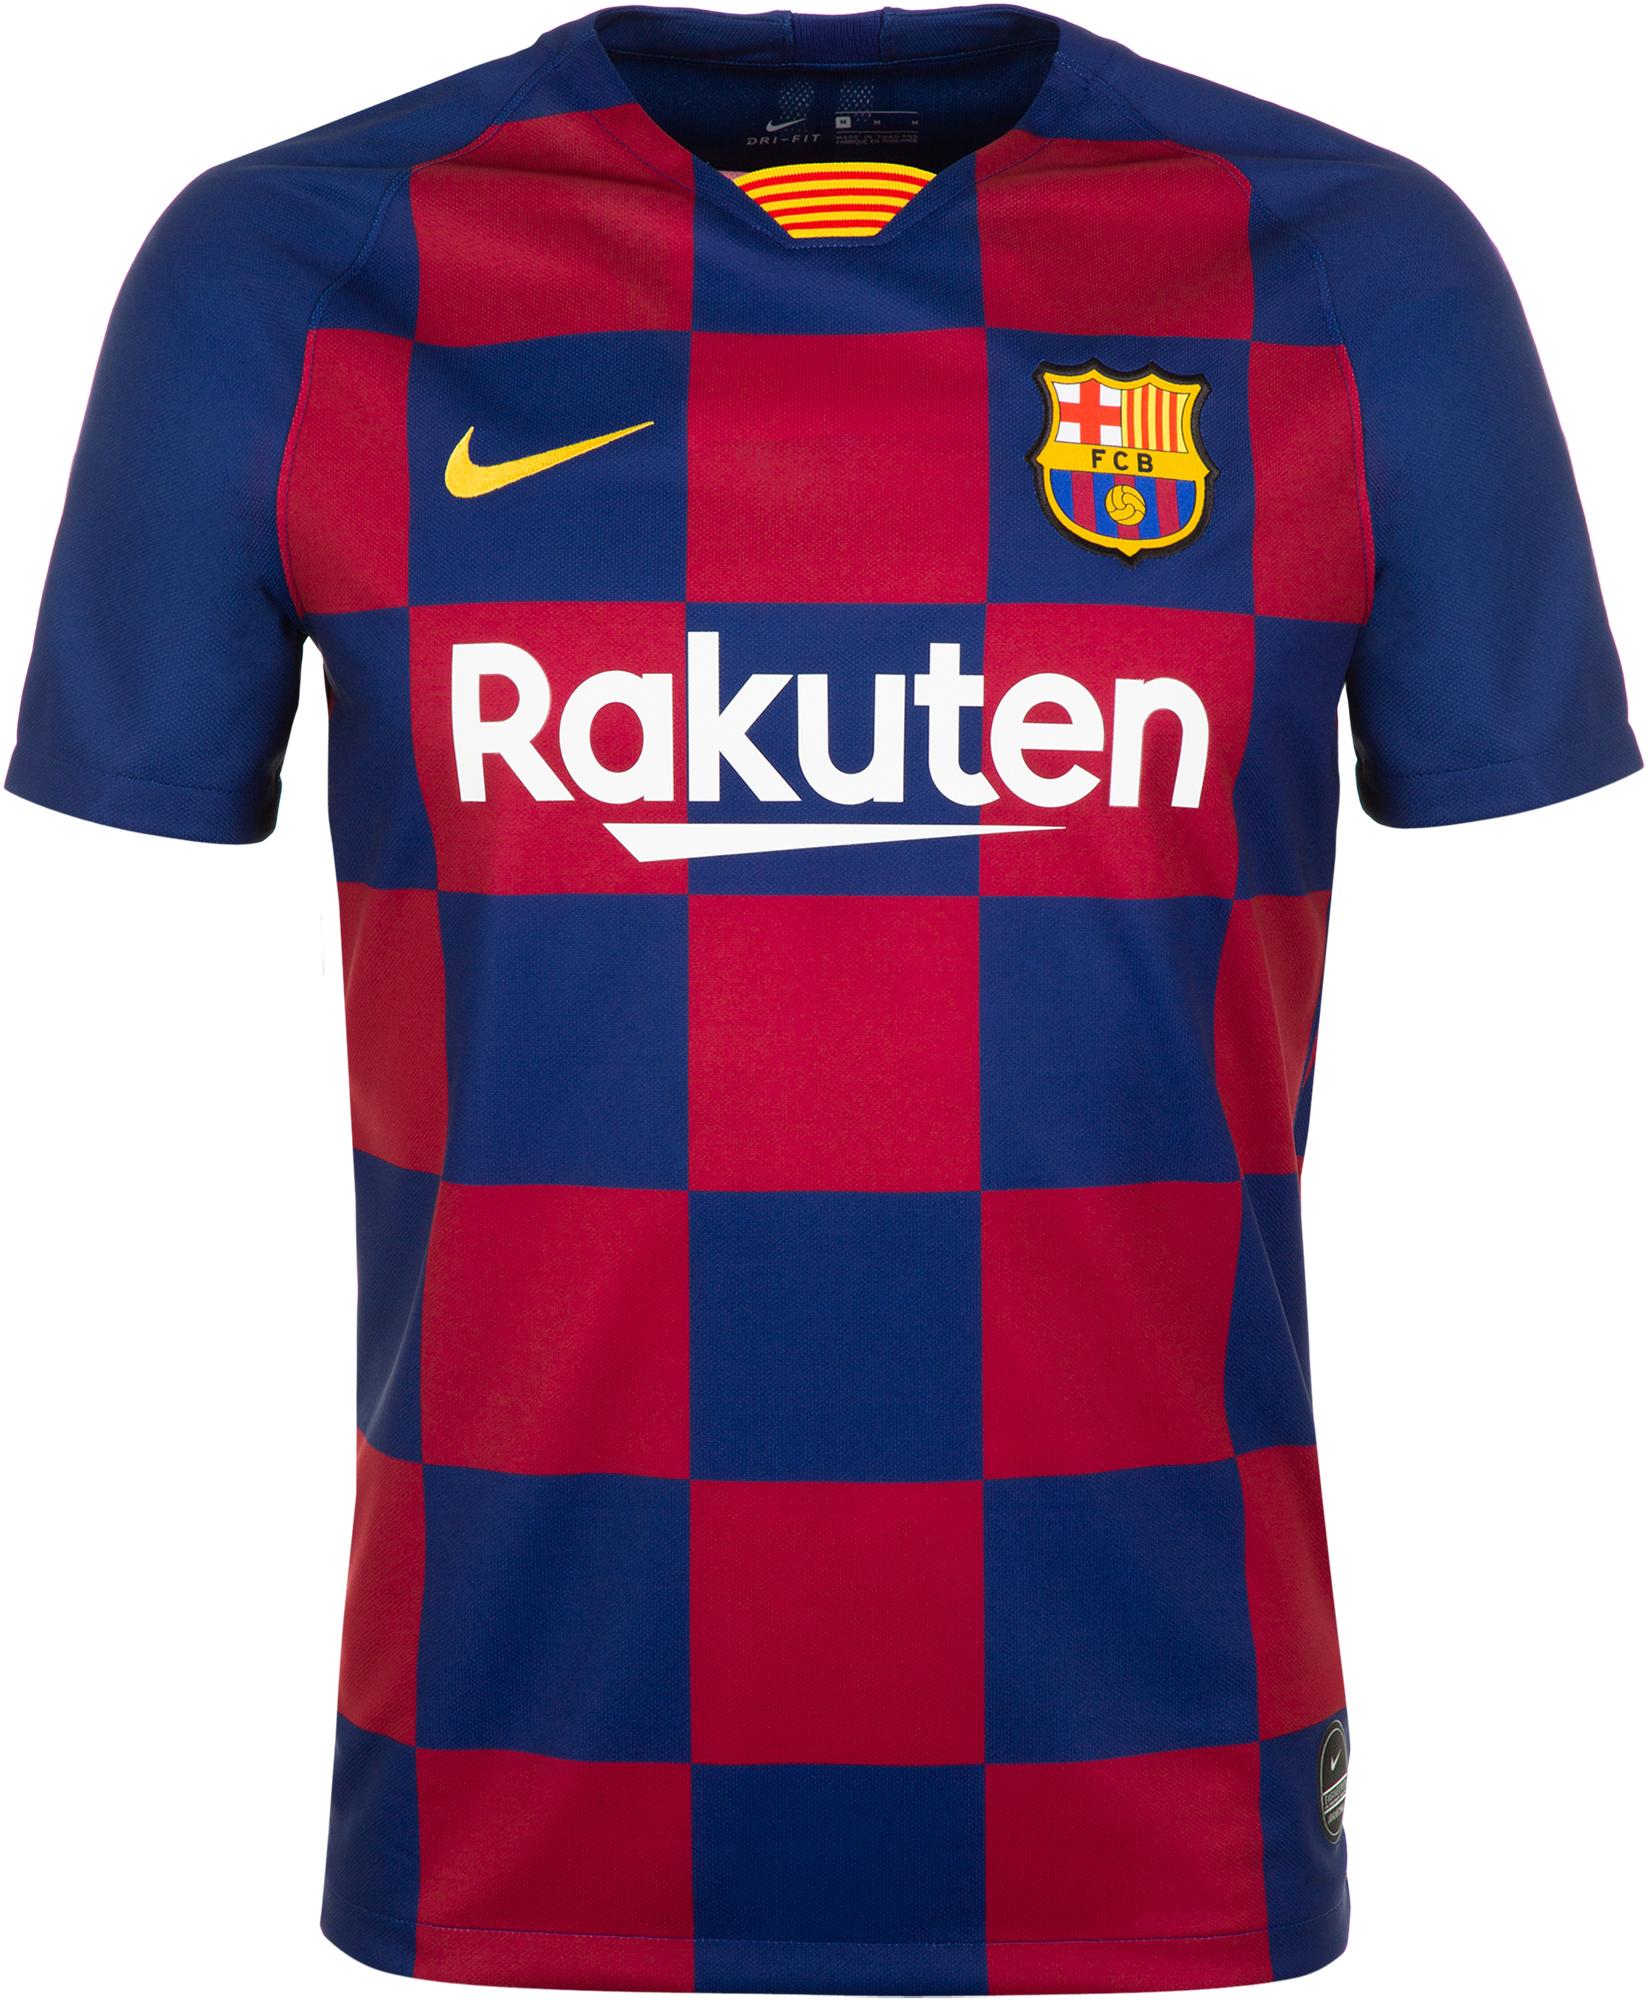 Nike Футболка мужская Nike FC Barcelona Stadium Home, размер 46-48 женская игровая футболка nike barcelona home stadium 894447 456